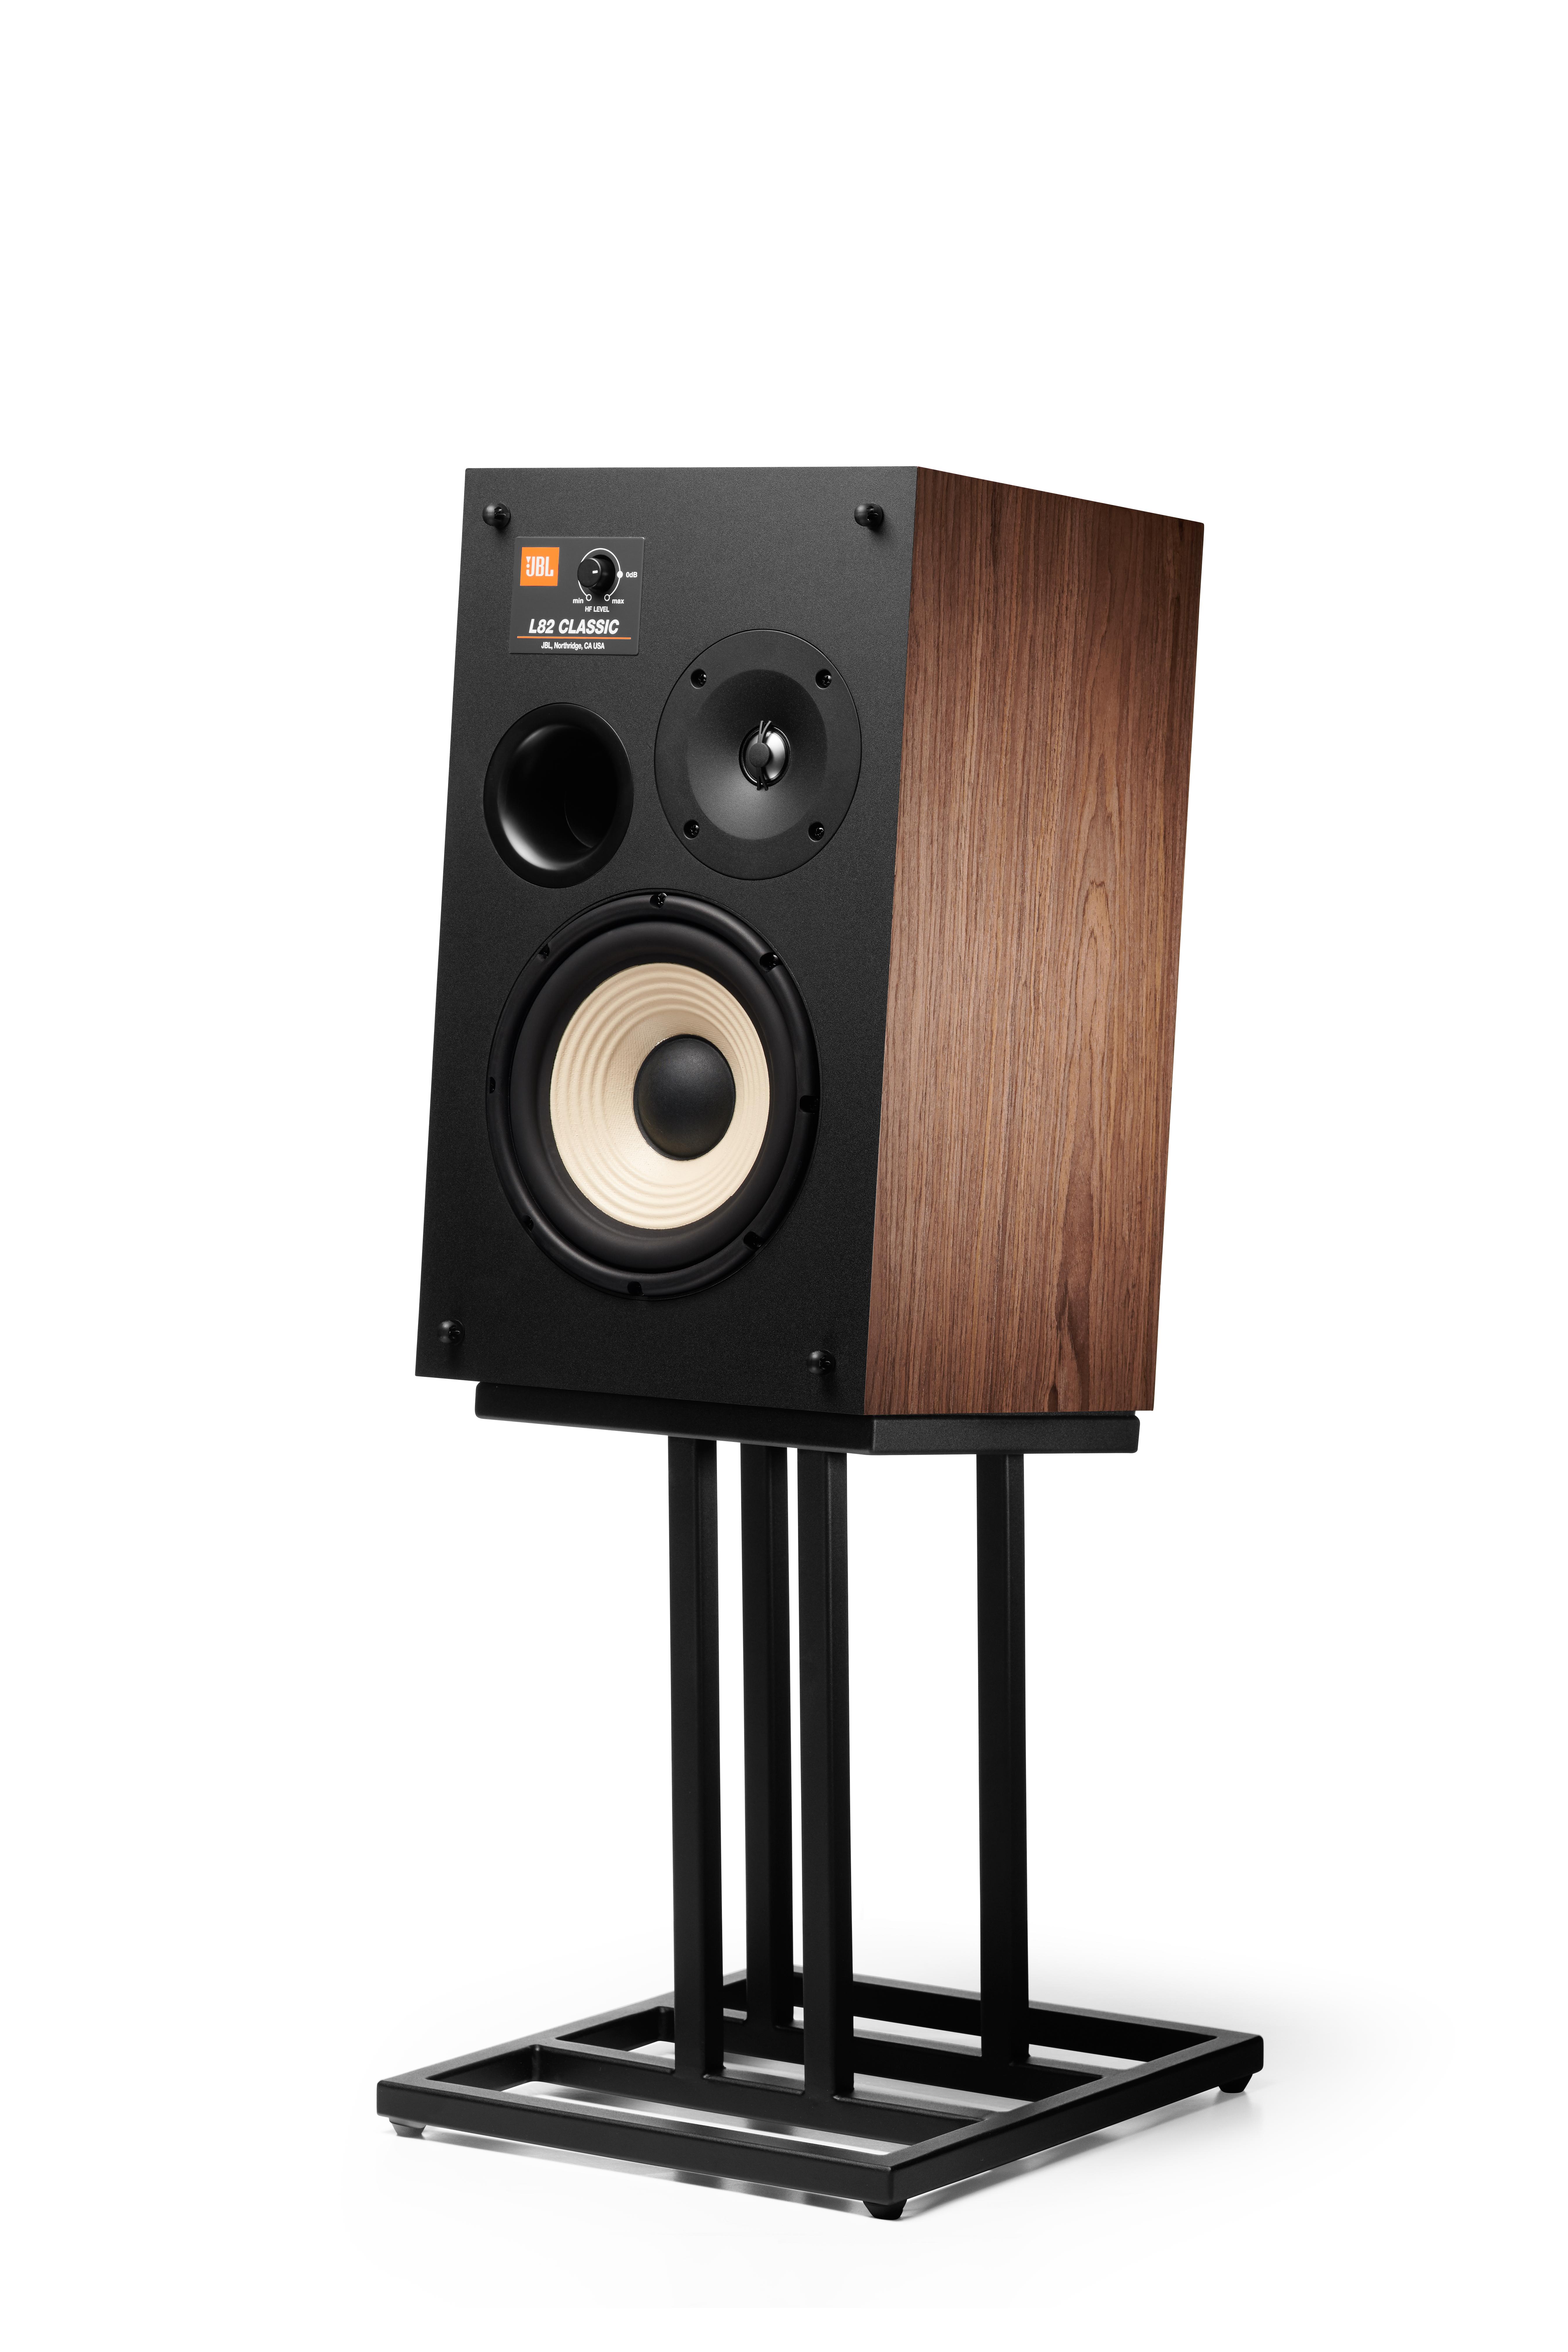 "L82 Classic - Black - 8"" (200mm) 2-way Bookshelf Loudspeaker - Detailshot 3"